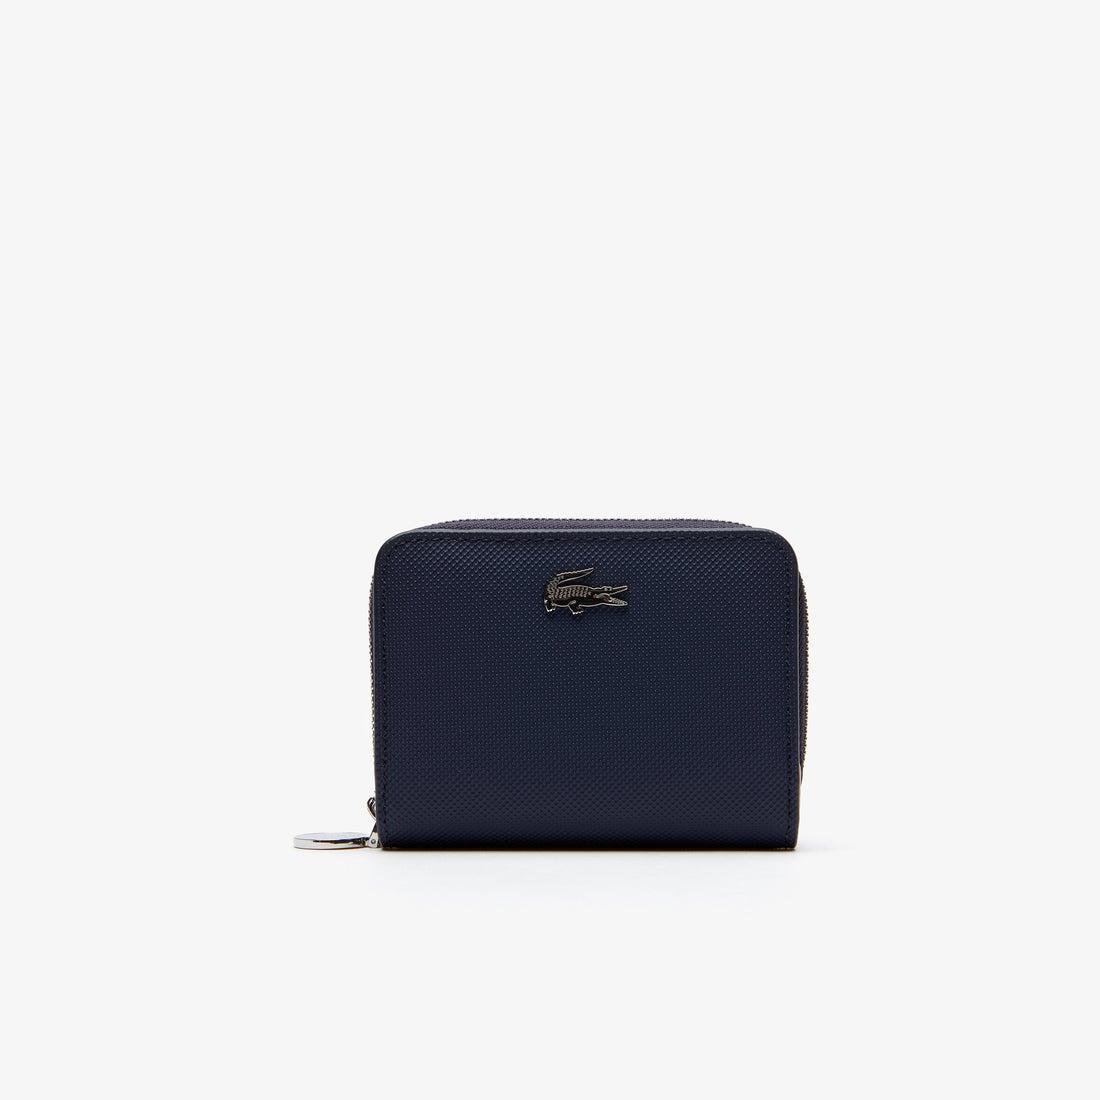 a0534eae2d1e ラコステ(LACOSTE) 財布 | 通販・人気ランキング - 価格.com